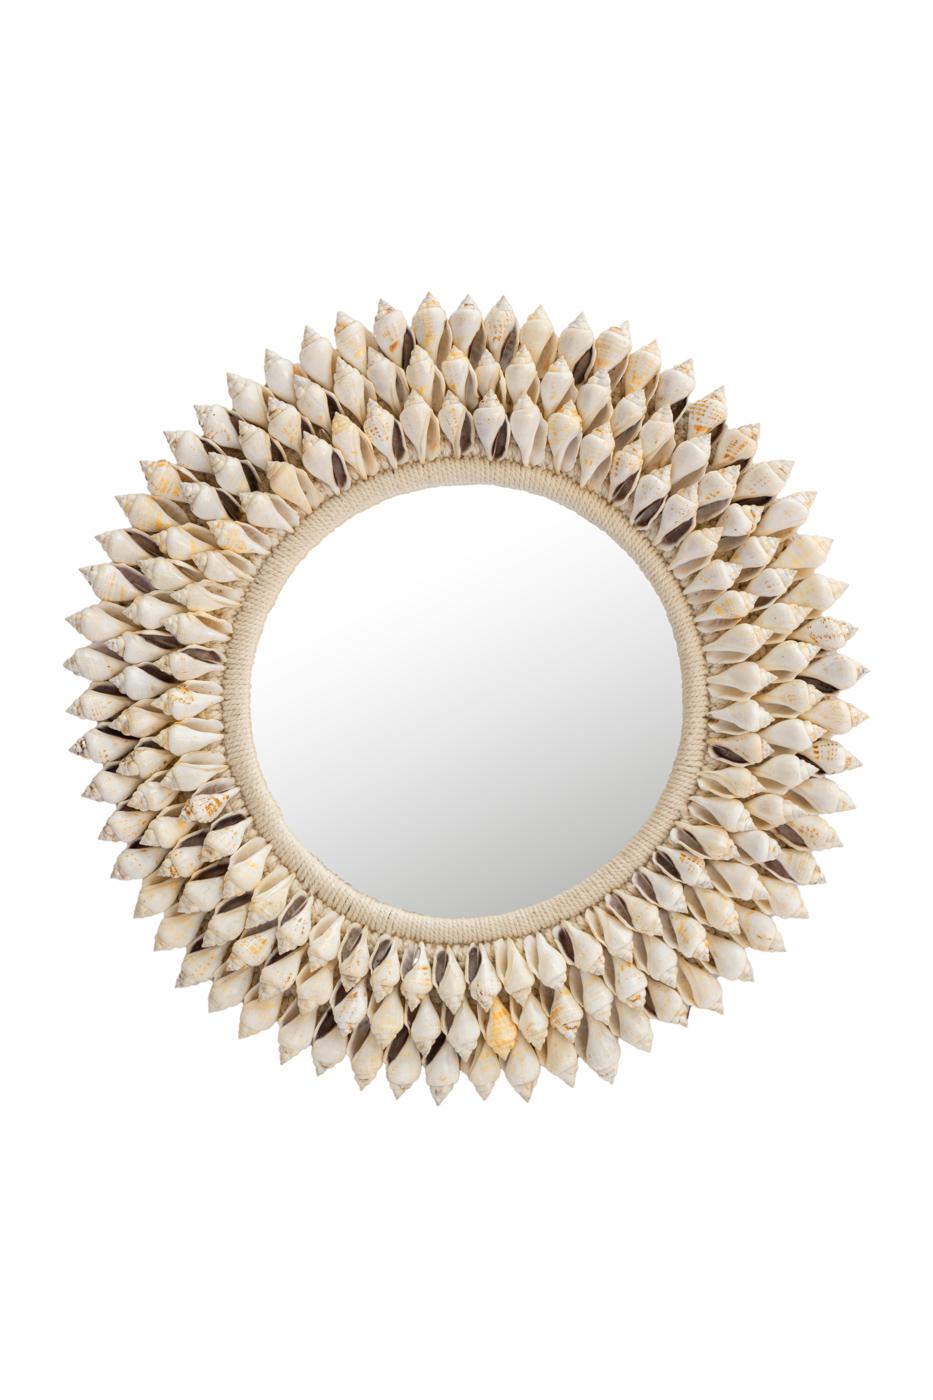 Natural snail shell mirror